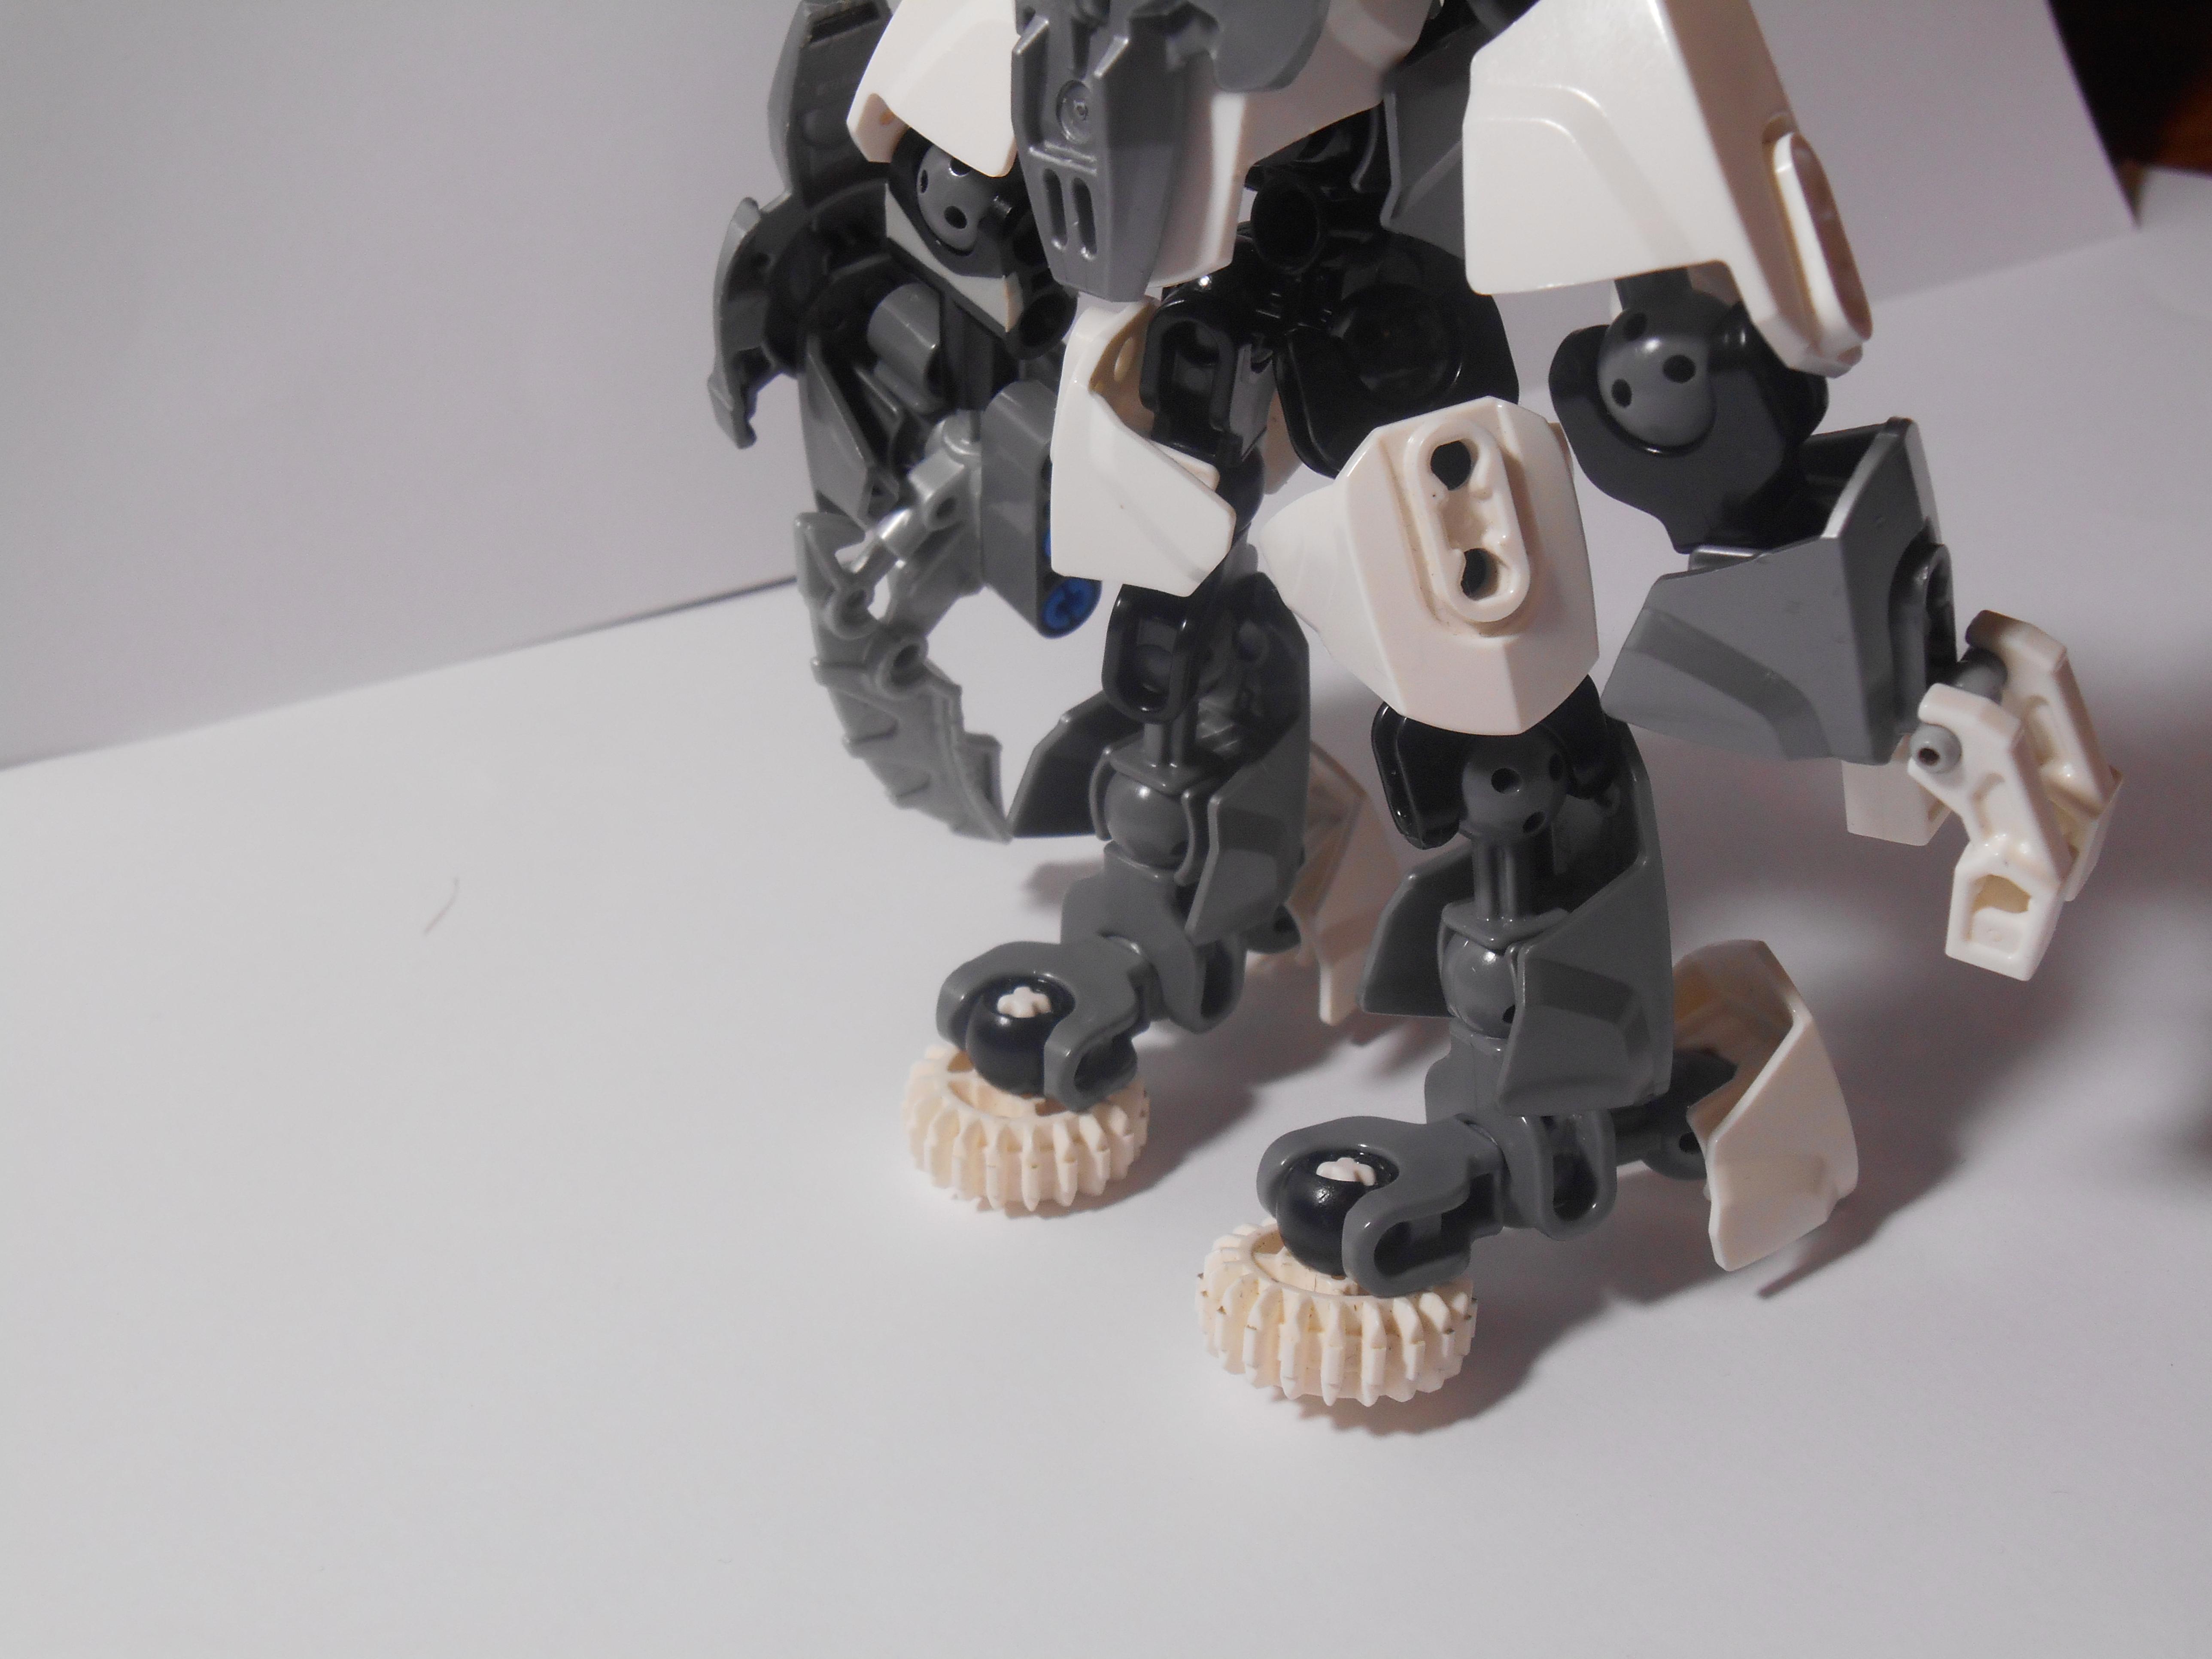 [MOC] Les mocs de Skrall789 (Nouveau Moc : MOCS BFGM : Akhatos - God of the Skull Spiders)  - Page 9 287319DSCN0278